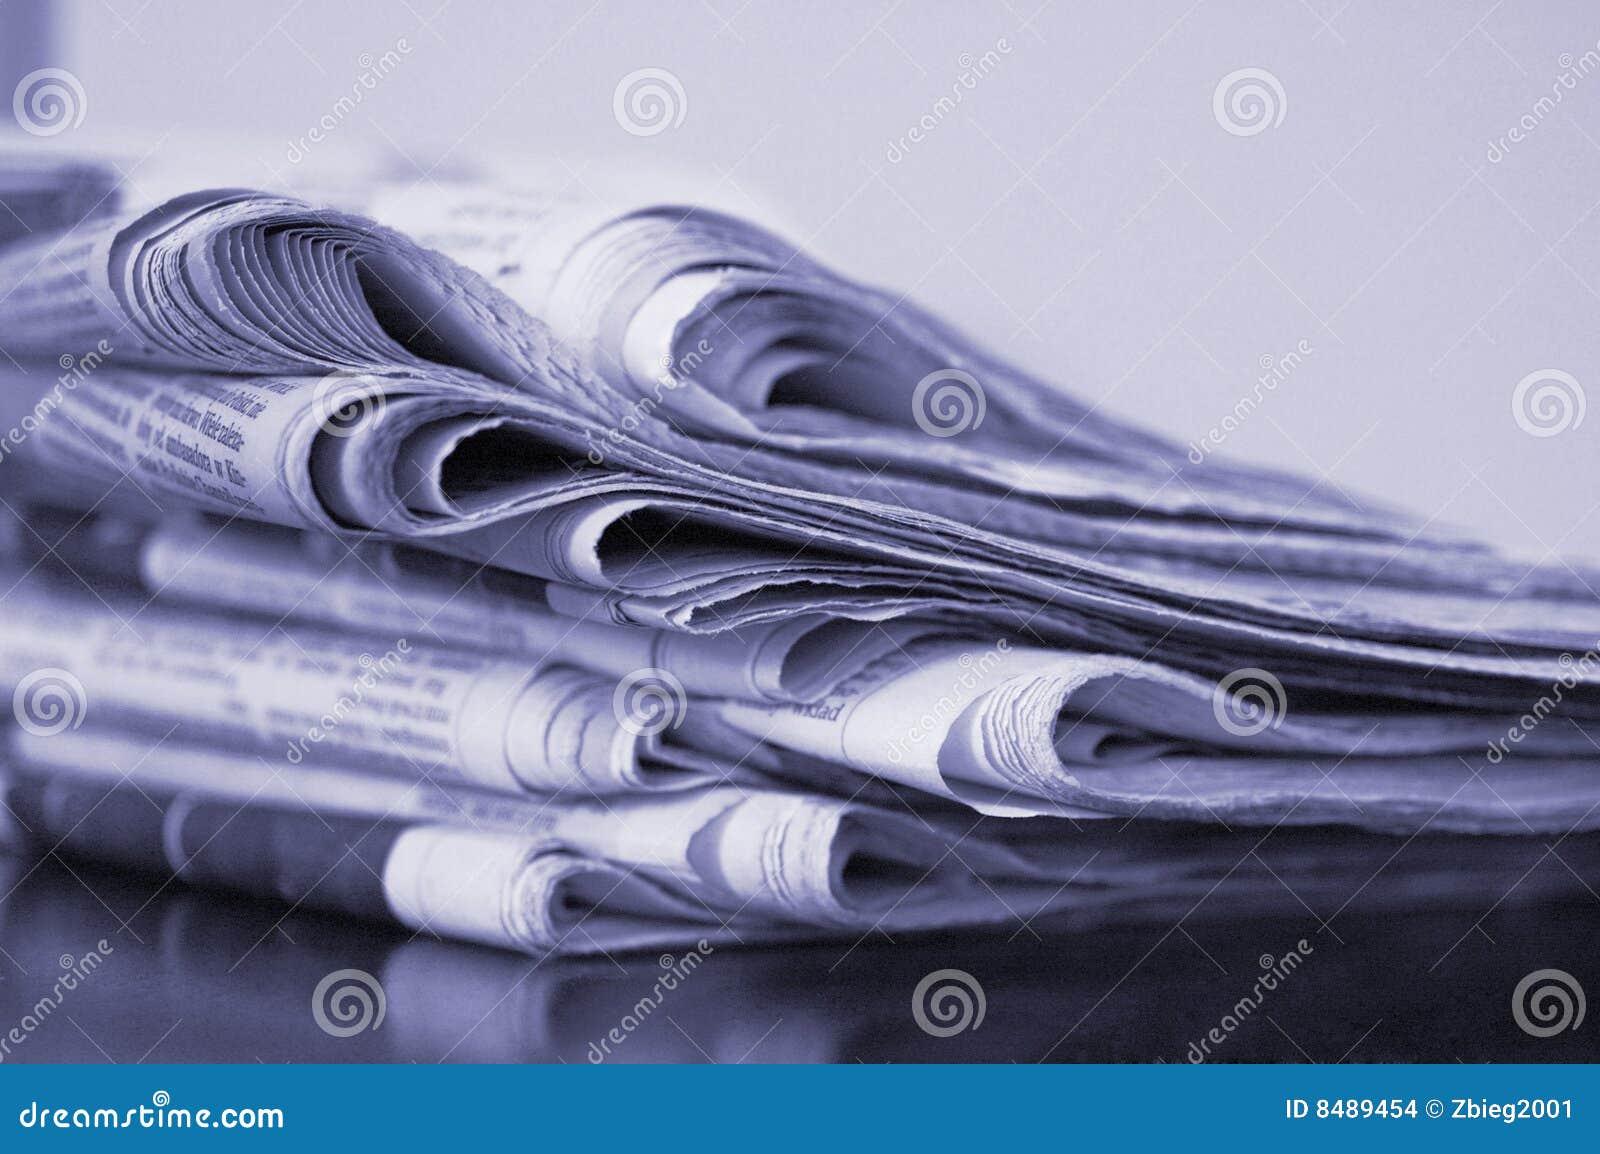 Pila de periódico